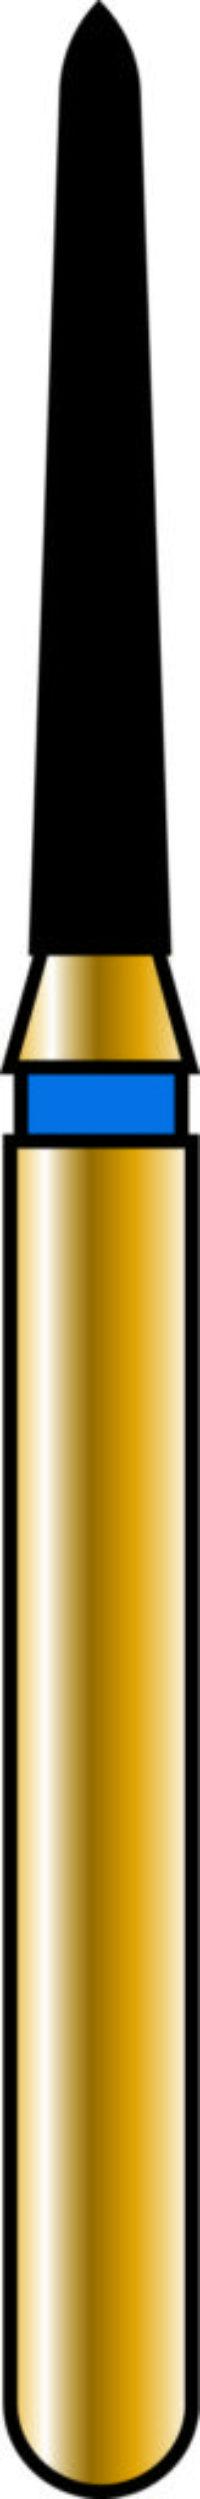 Pointed Taper 12-8mm Gold Diamond Bur